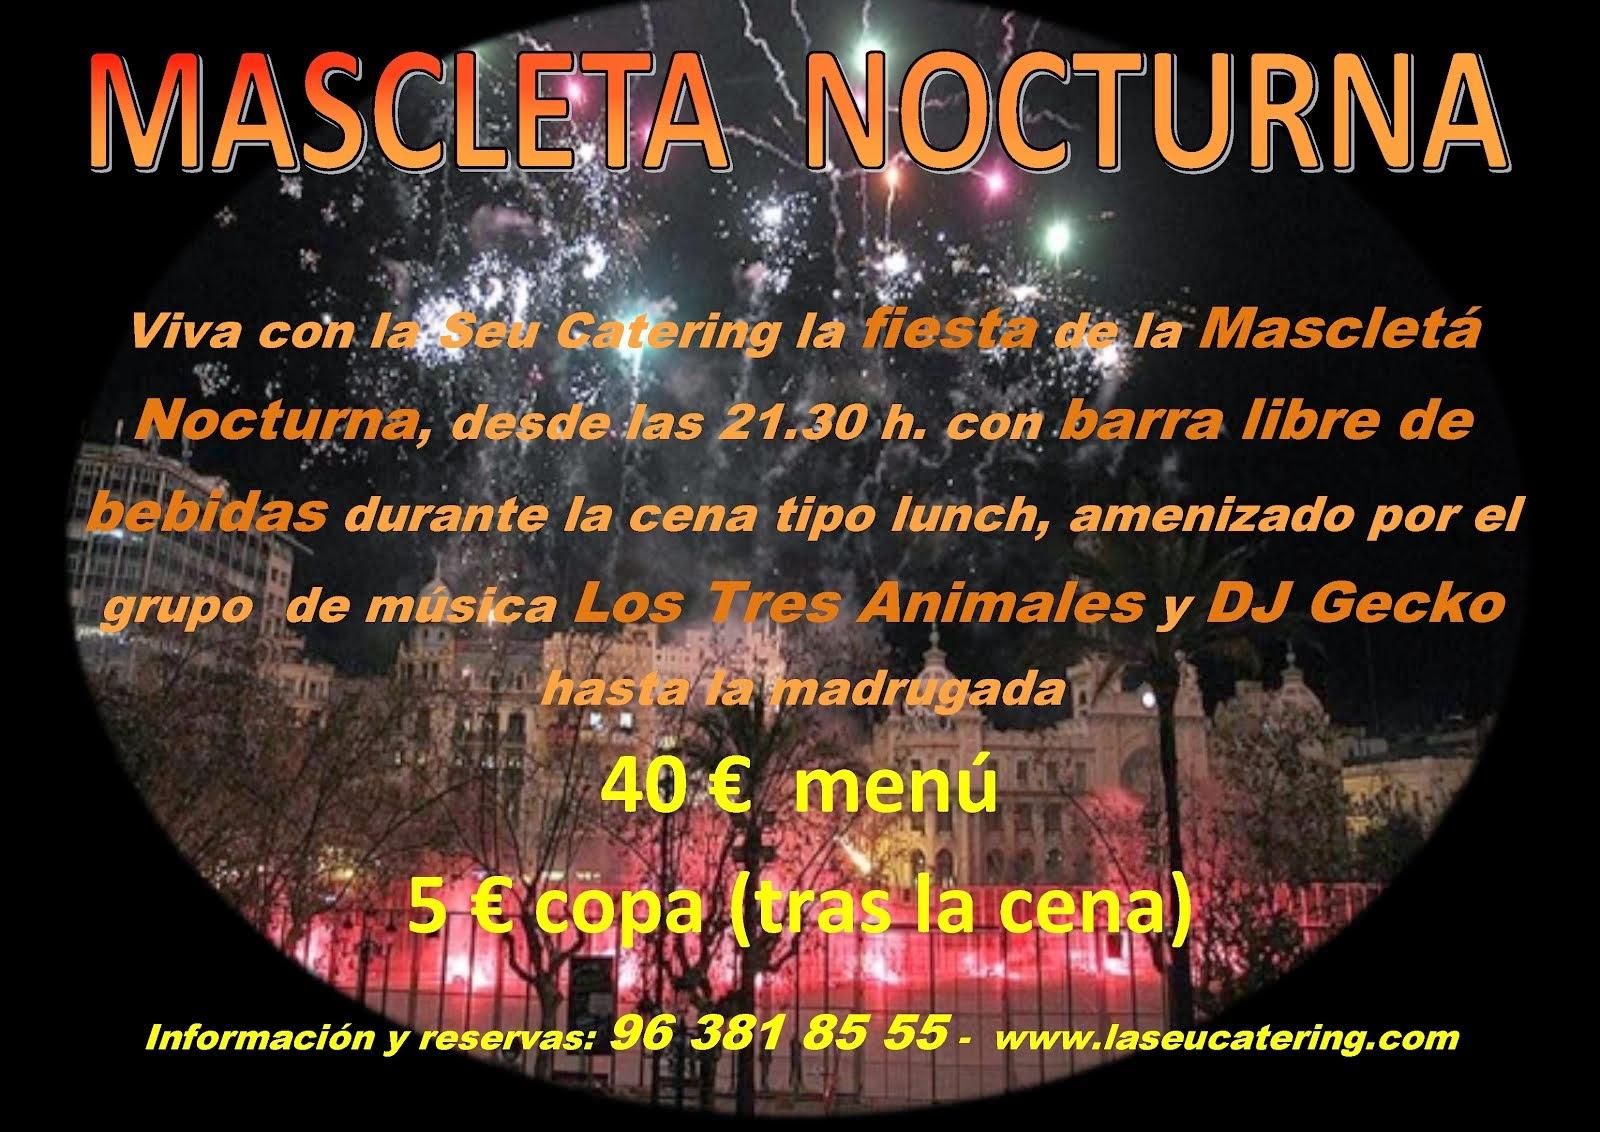 7 Marzo - Mascleta Nocturna